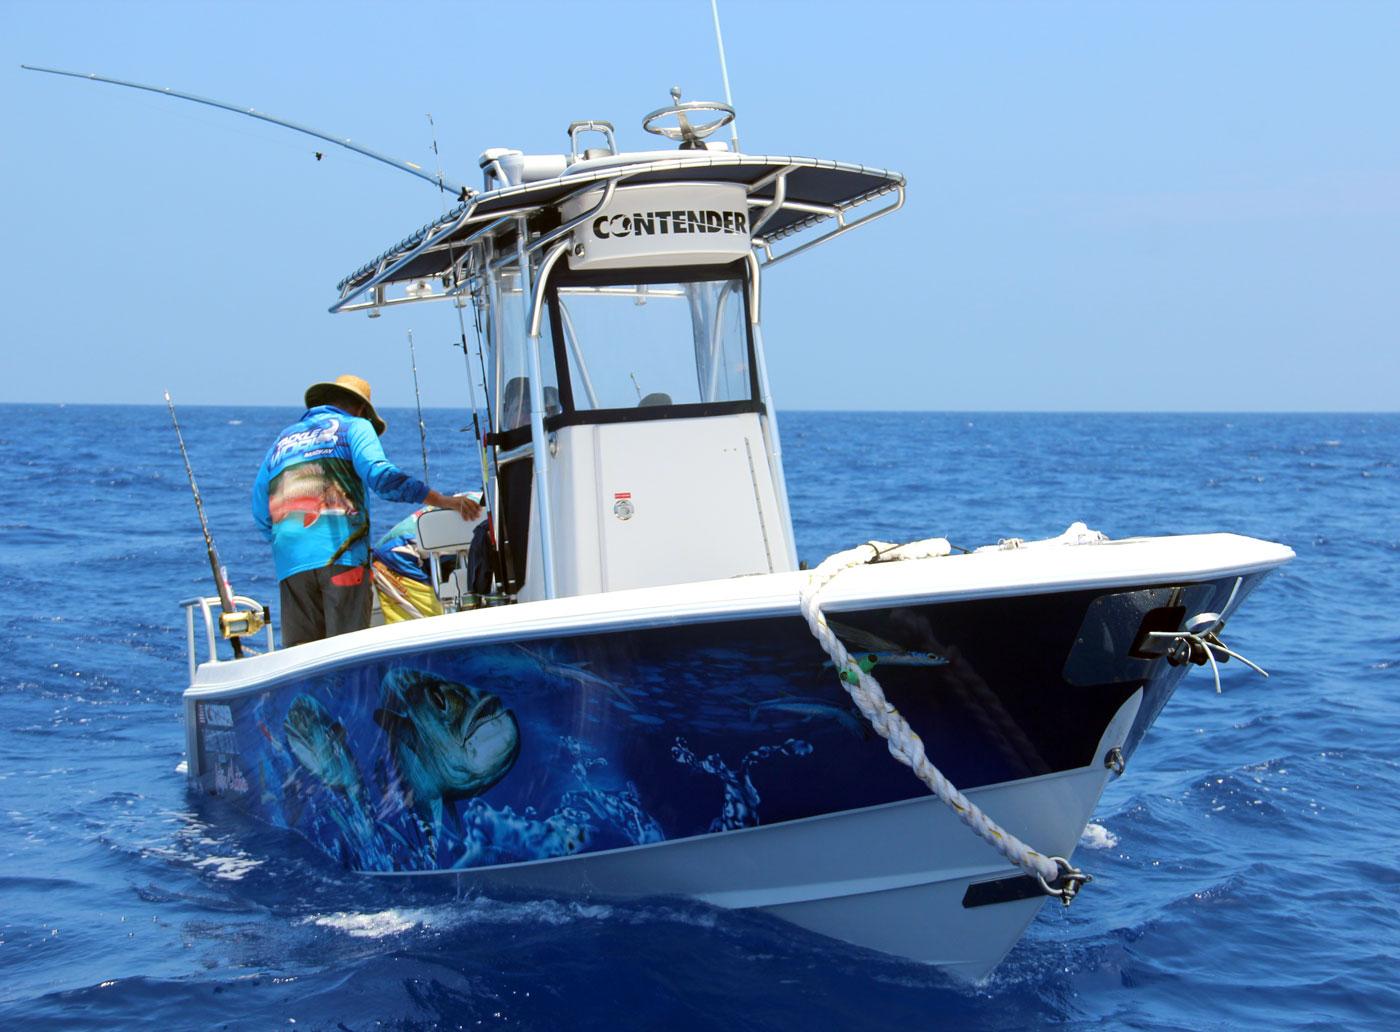 Contender-Fishing-Boat-Mackay.jpg